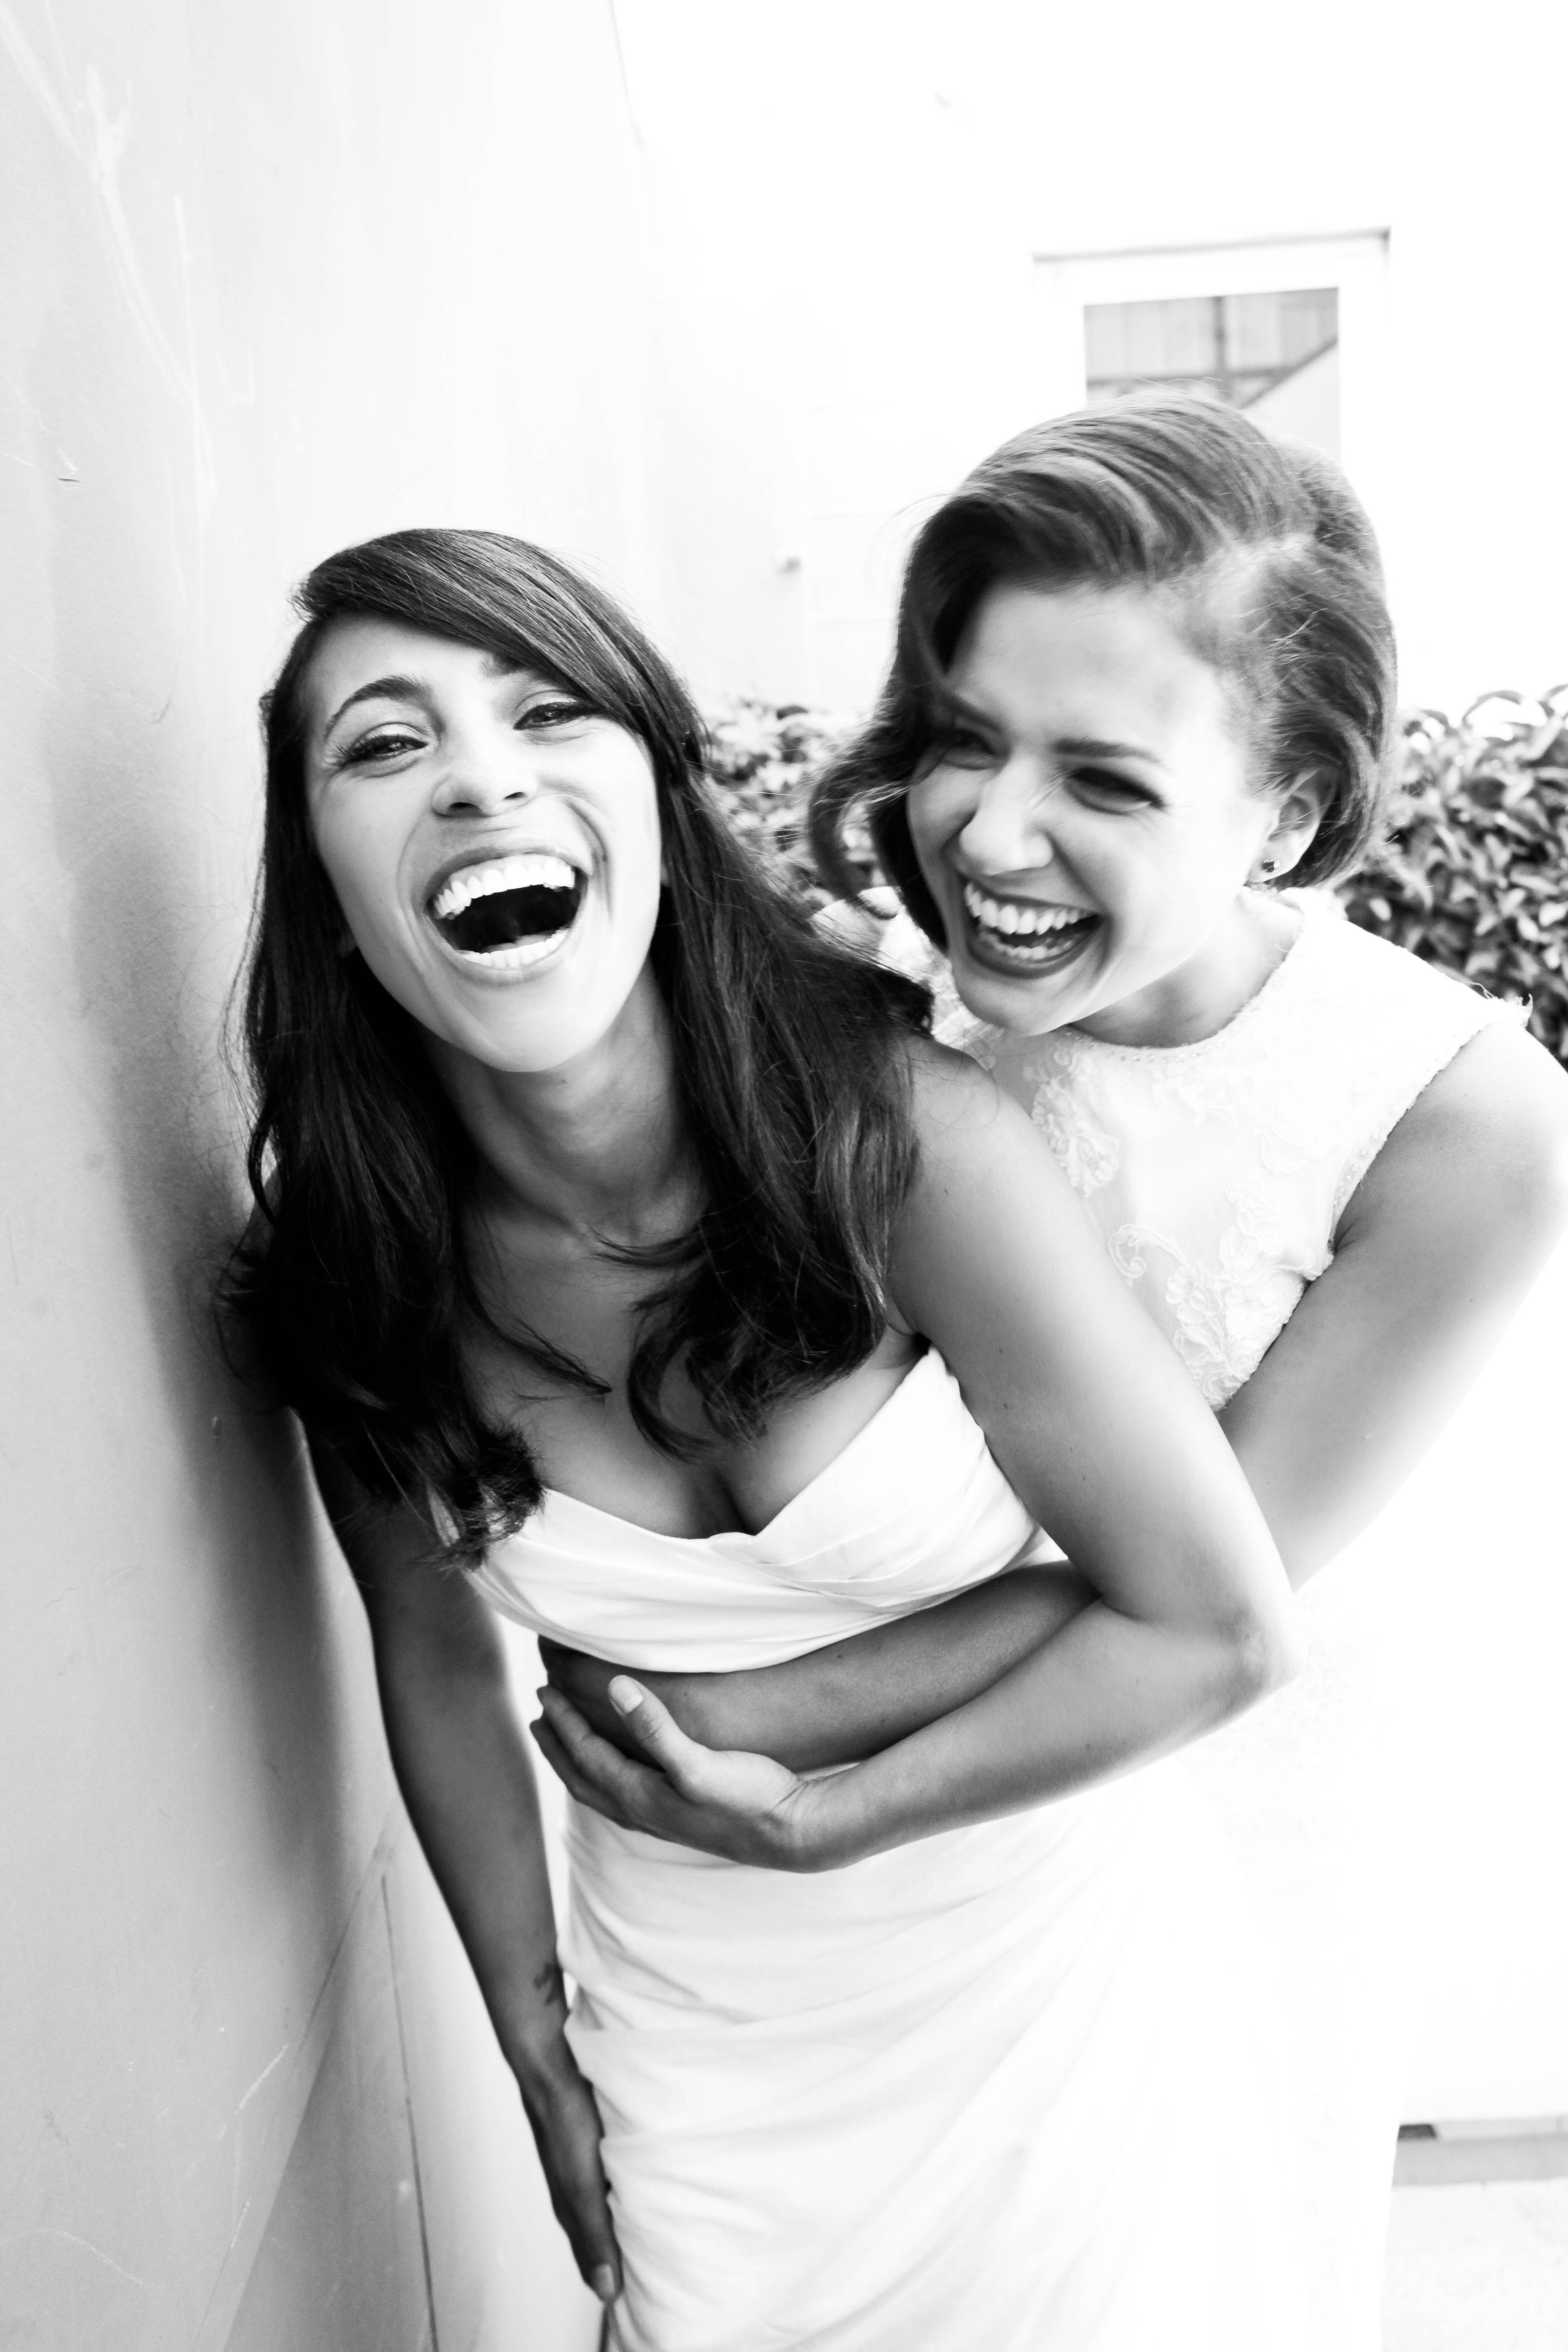 Lesbian Brides || Love & Laughter || wearemattandjess.com … | Pinteres…